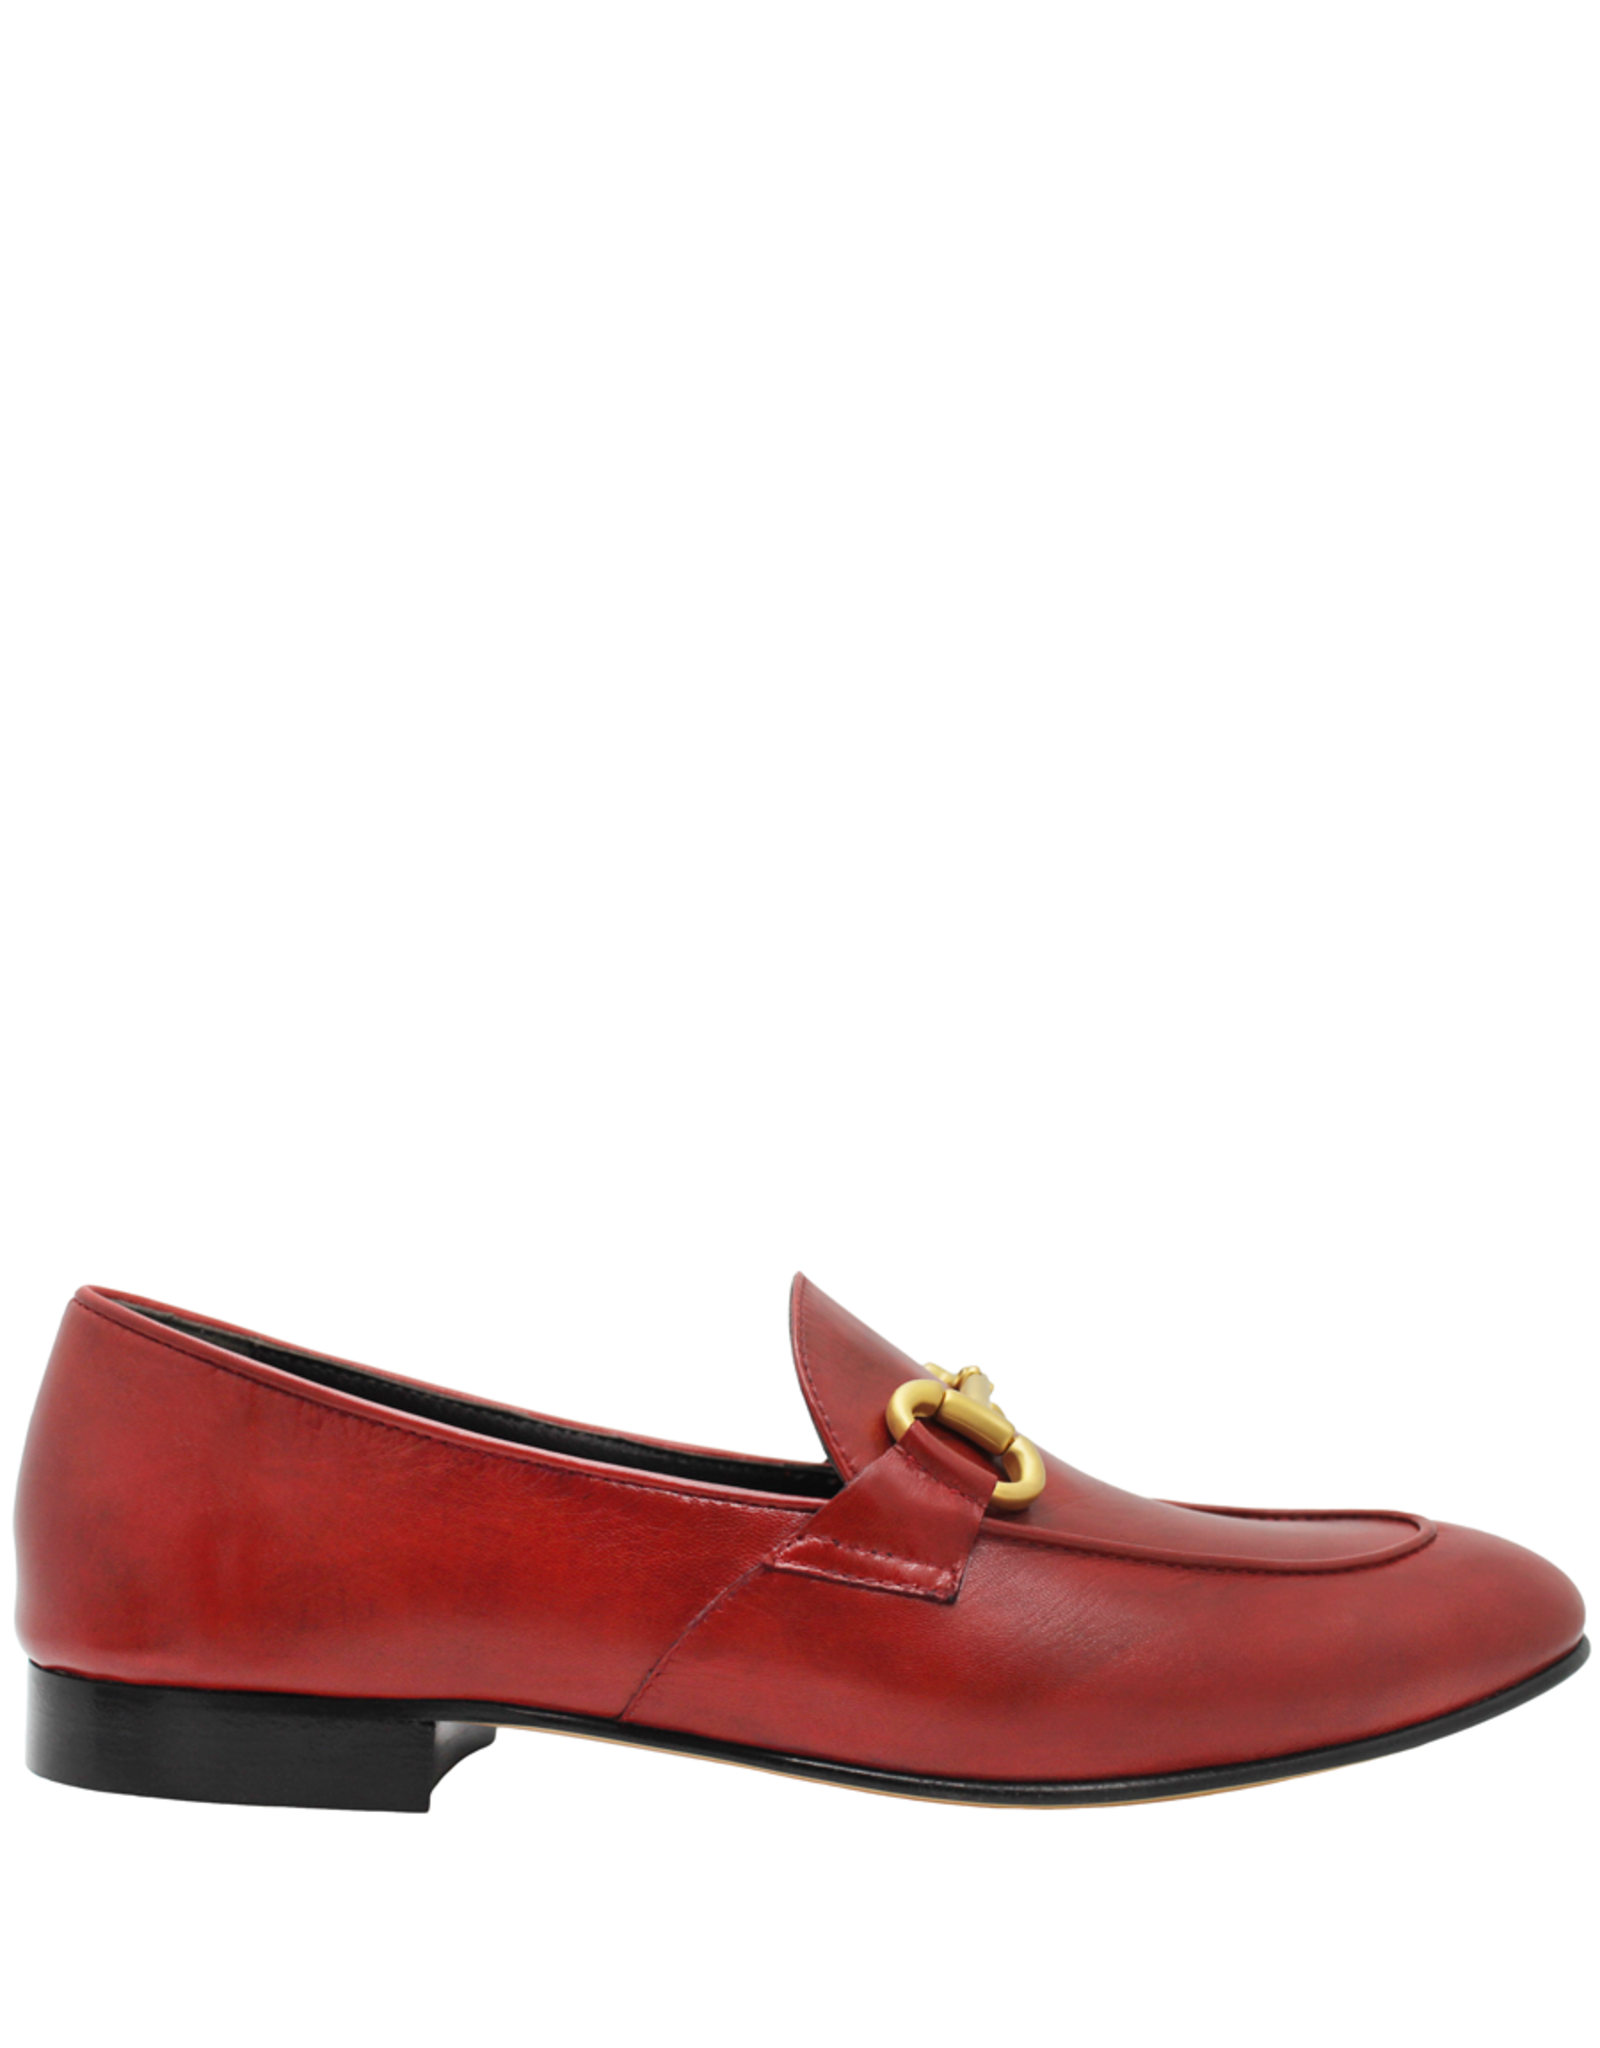 MaraBini MaraBini Red Loafer With Gold Bit 8125